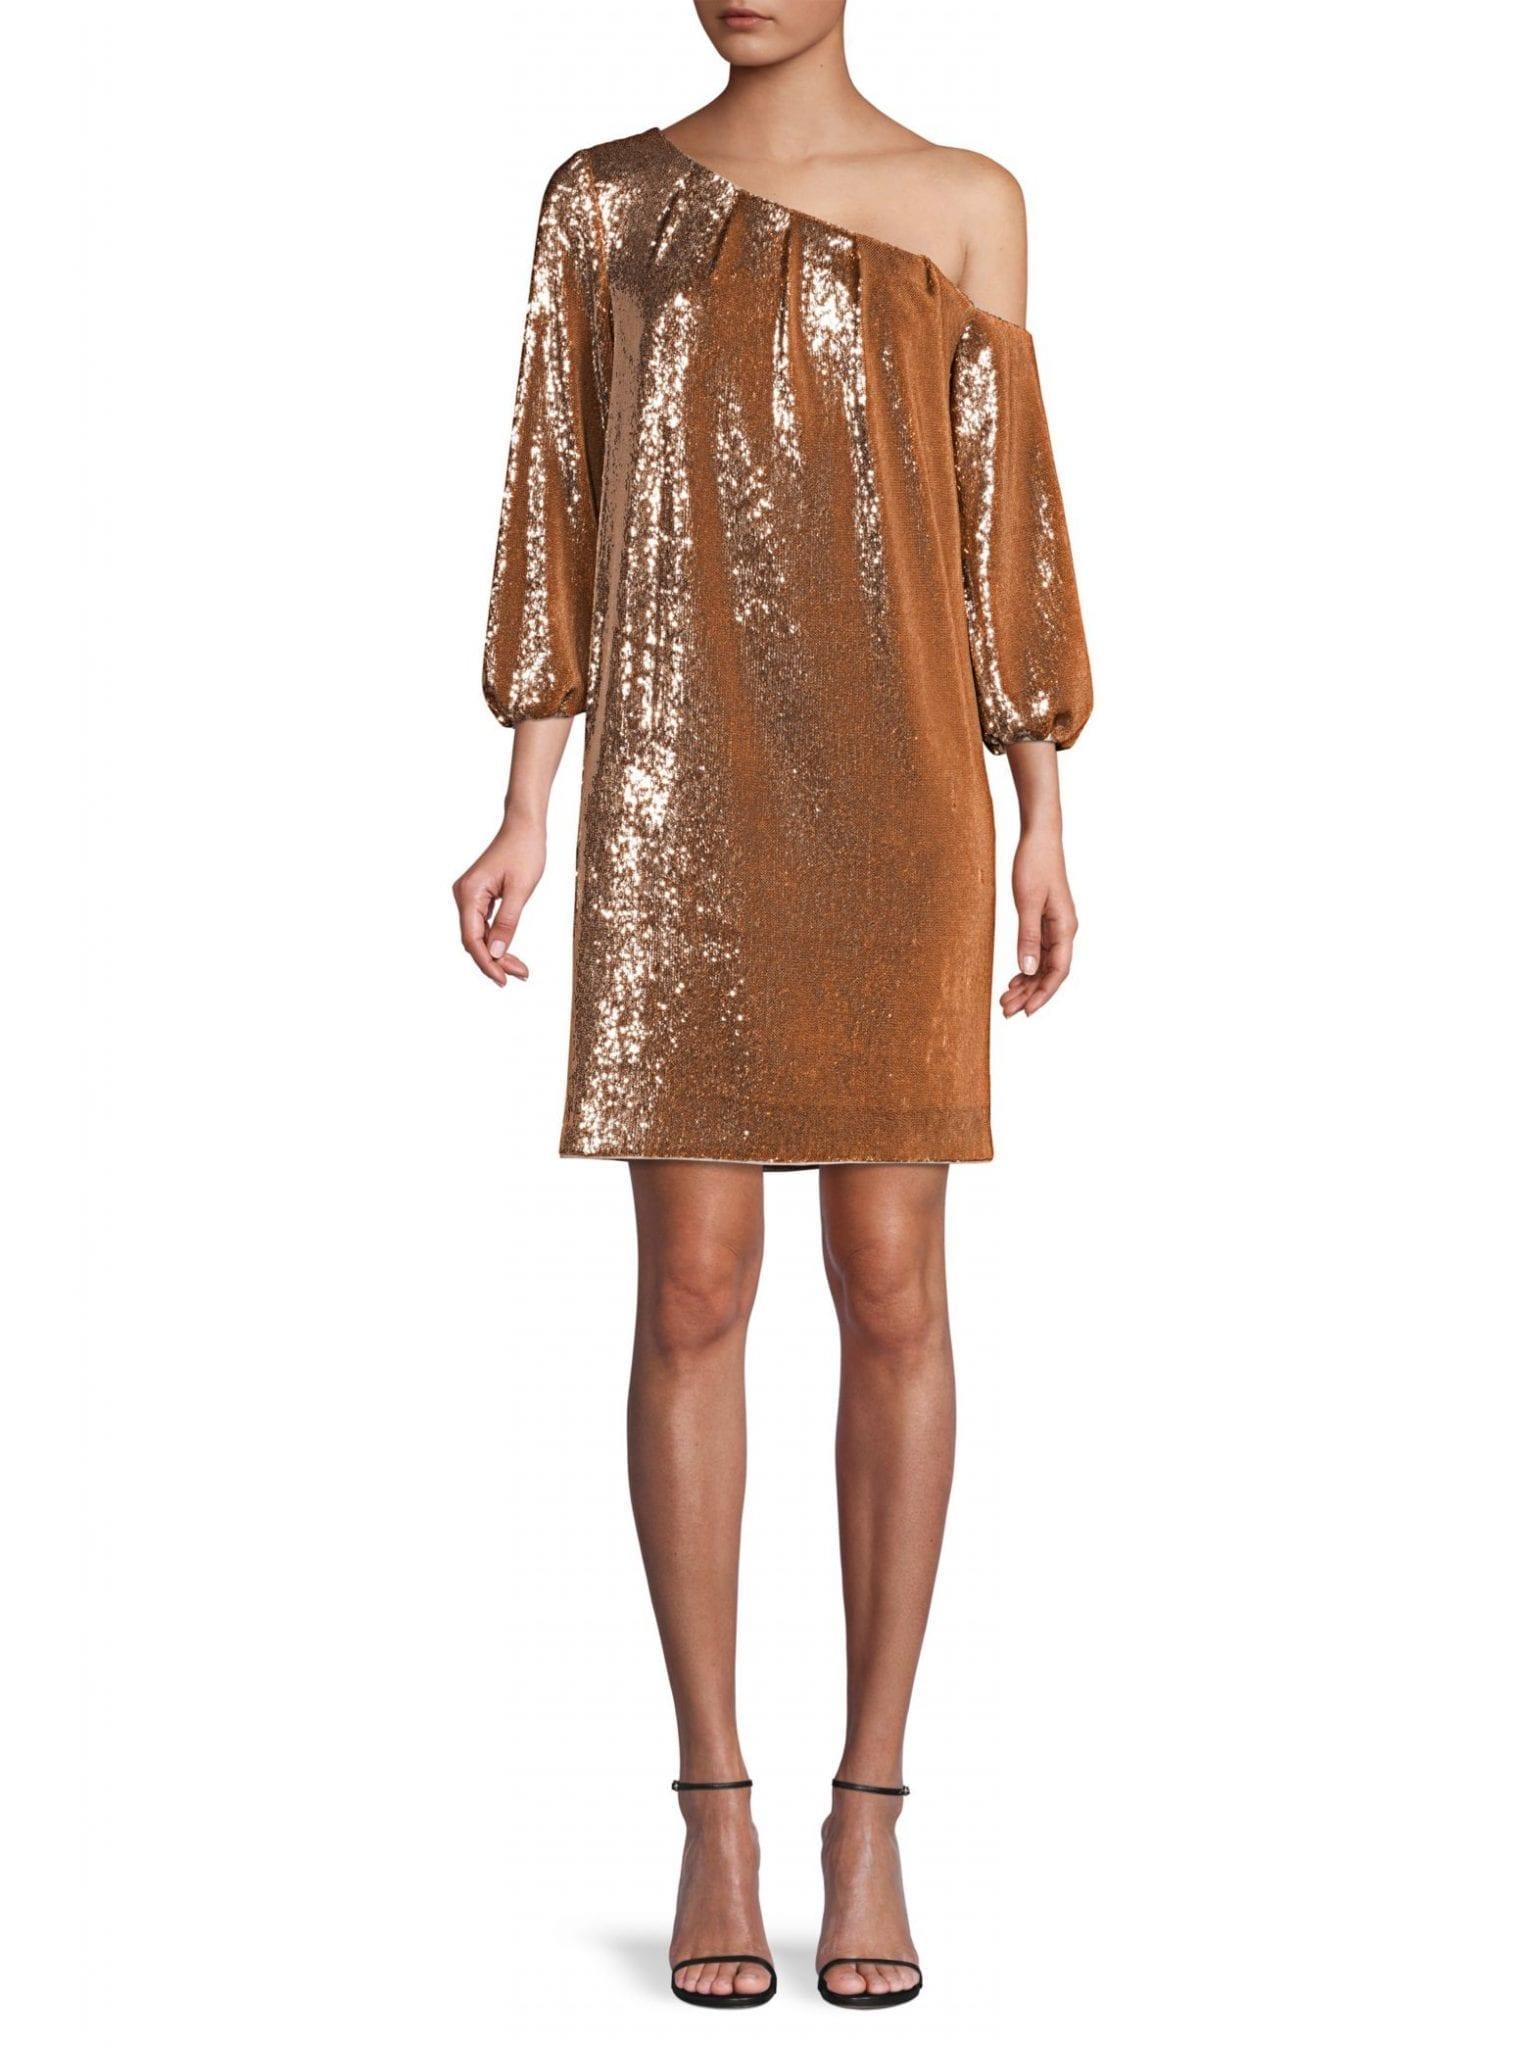 AIDAN BY AIDAN MATTOX Asymmetric Off-the-Shoulder Puff-Sleeve Sequin Shift Dress